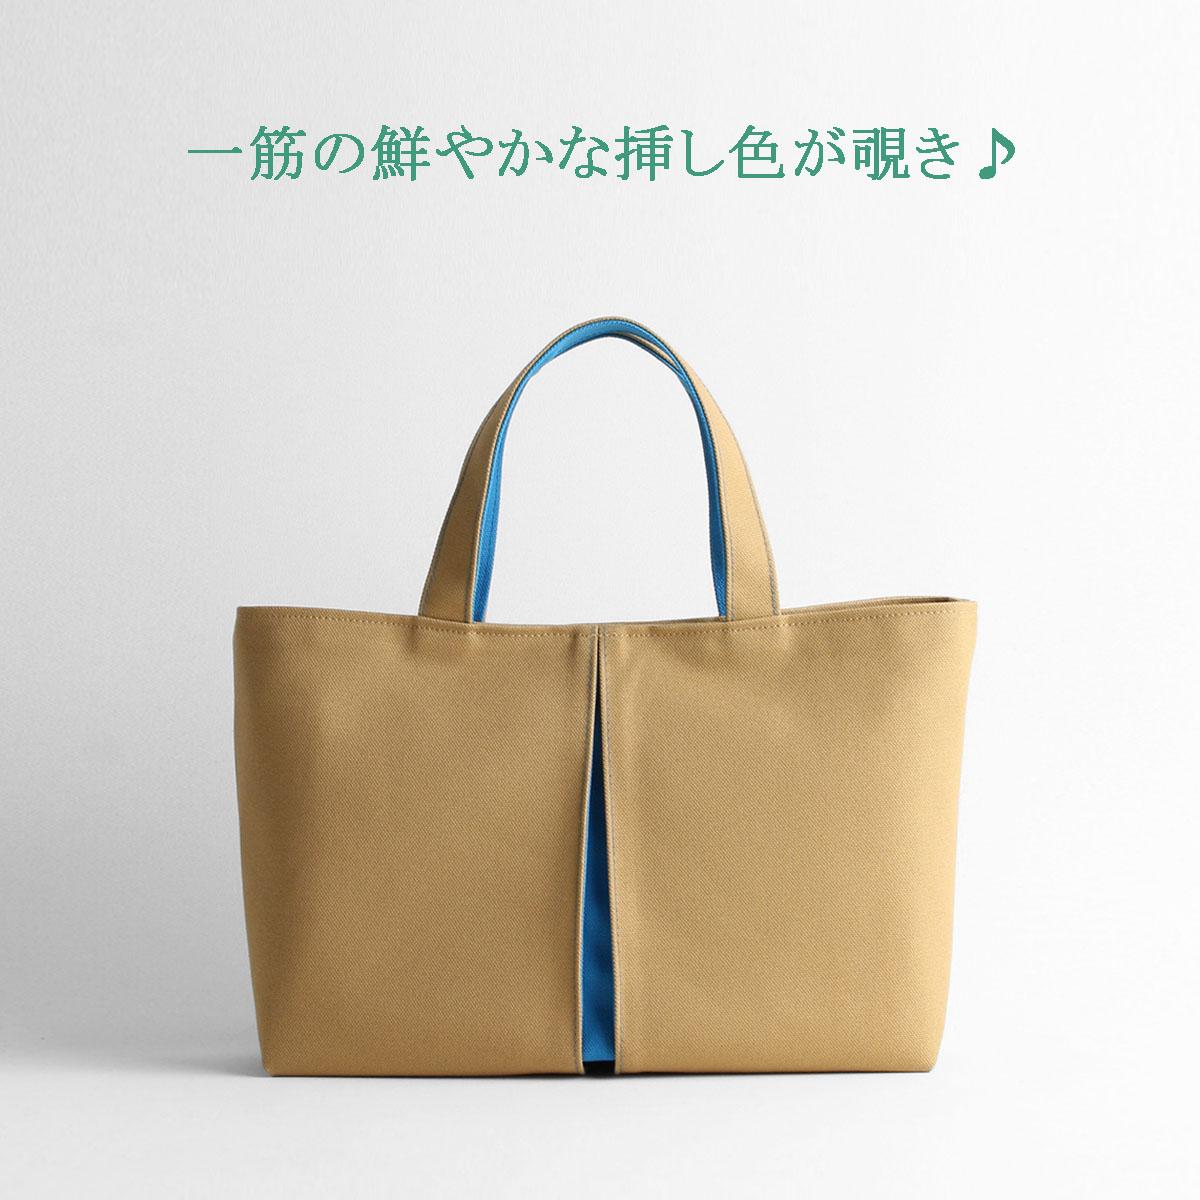 KOSHO ougi pleats 帆布 トートバッグ YM